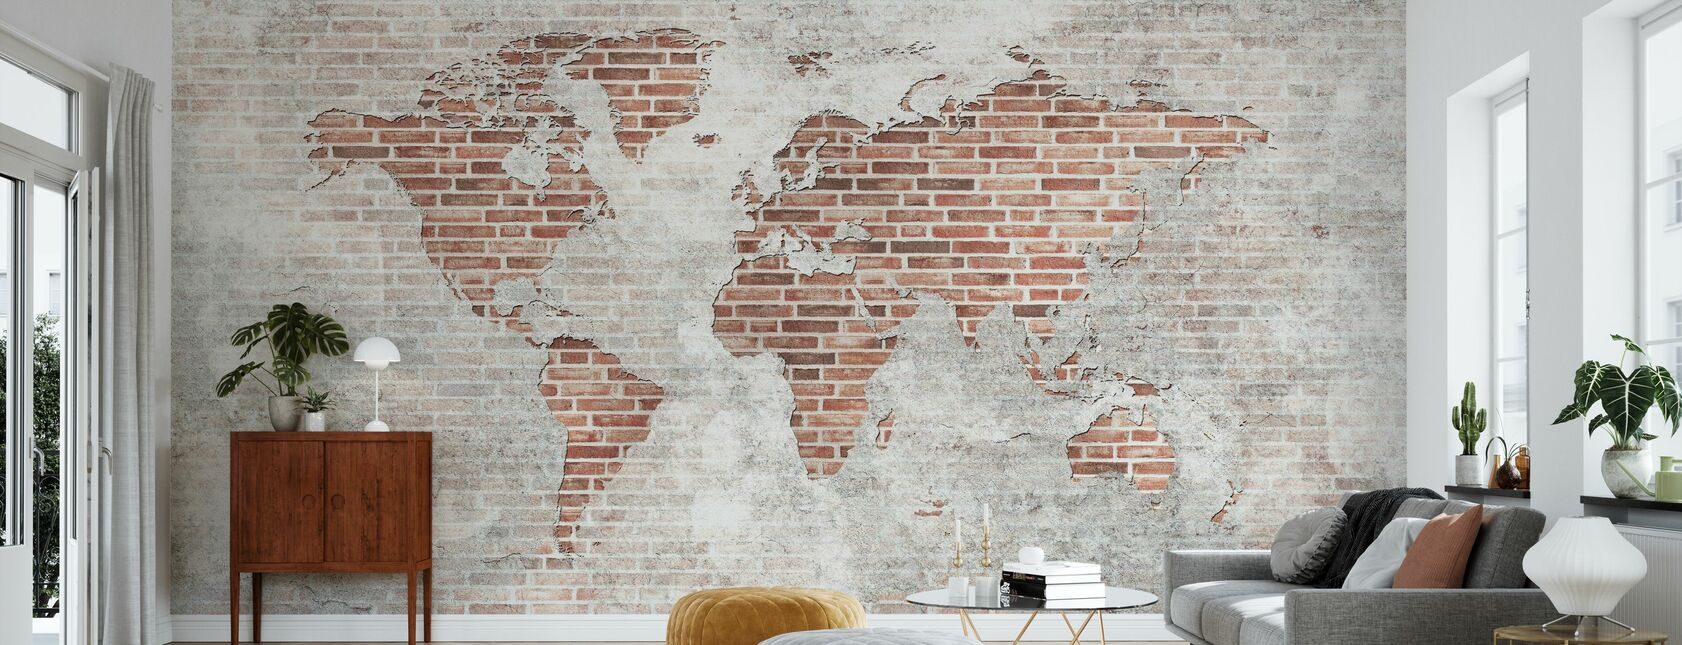 Brick Wall World Map - Wallpaper - Living Room